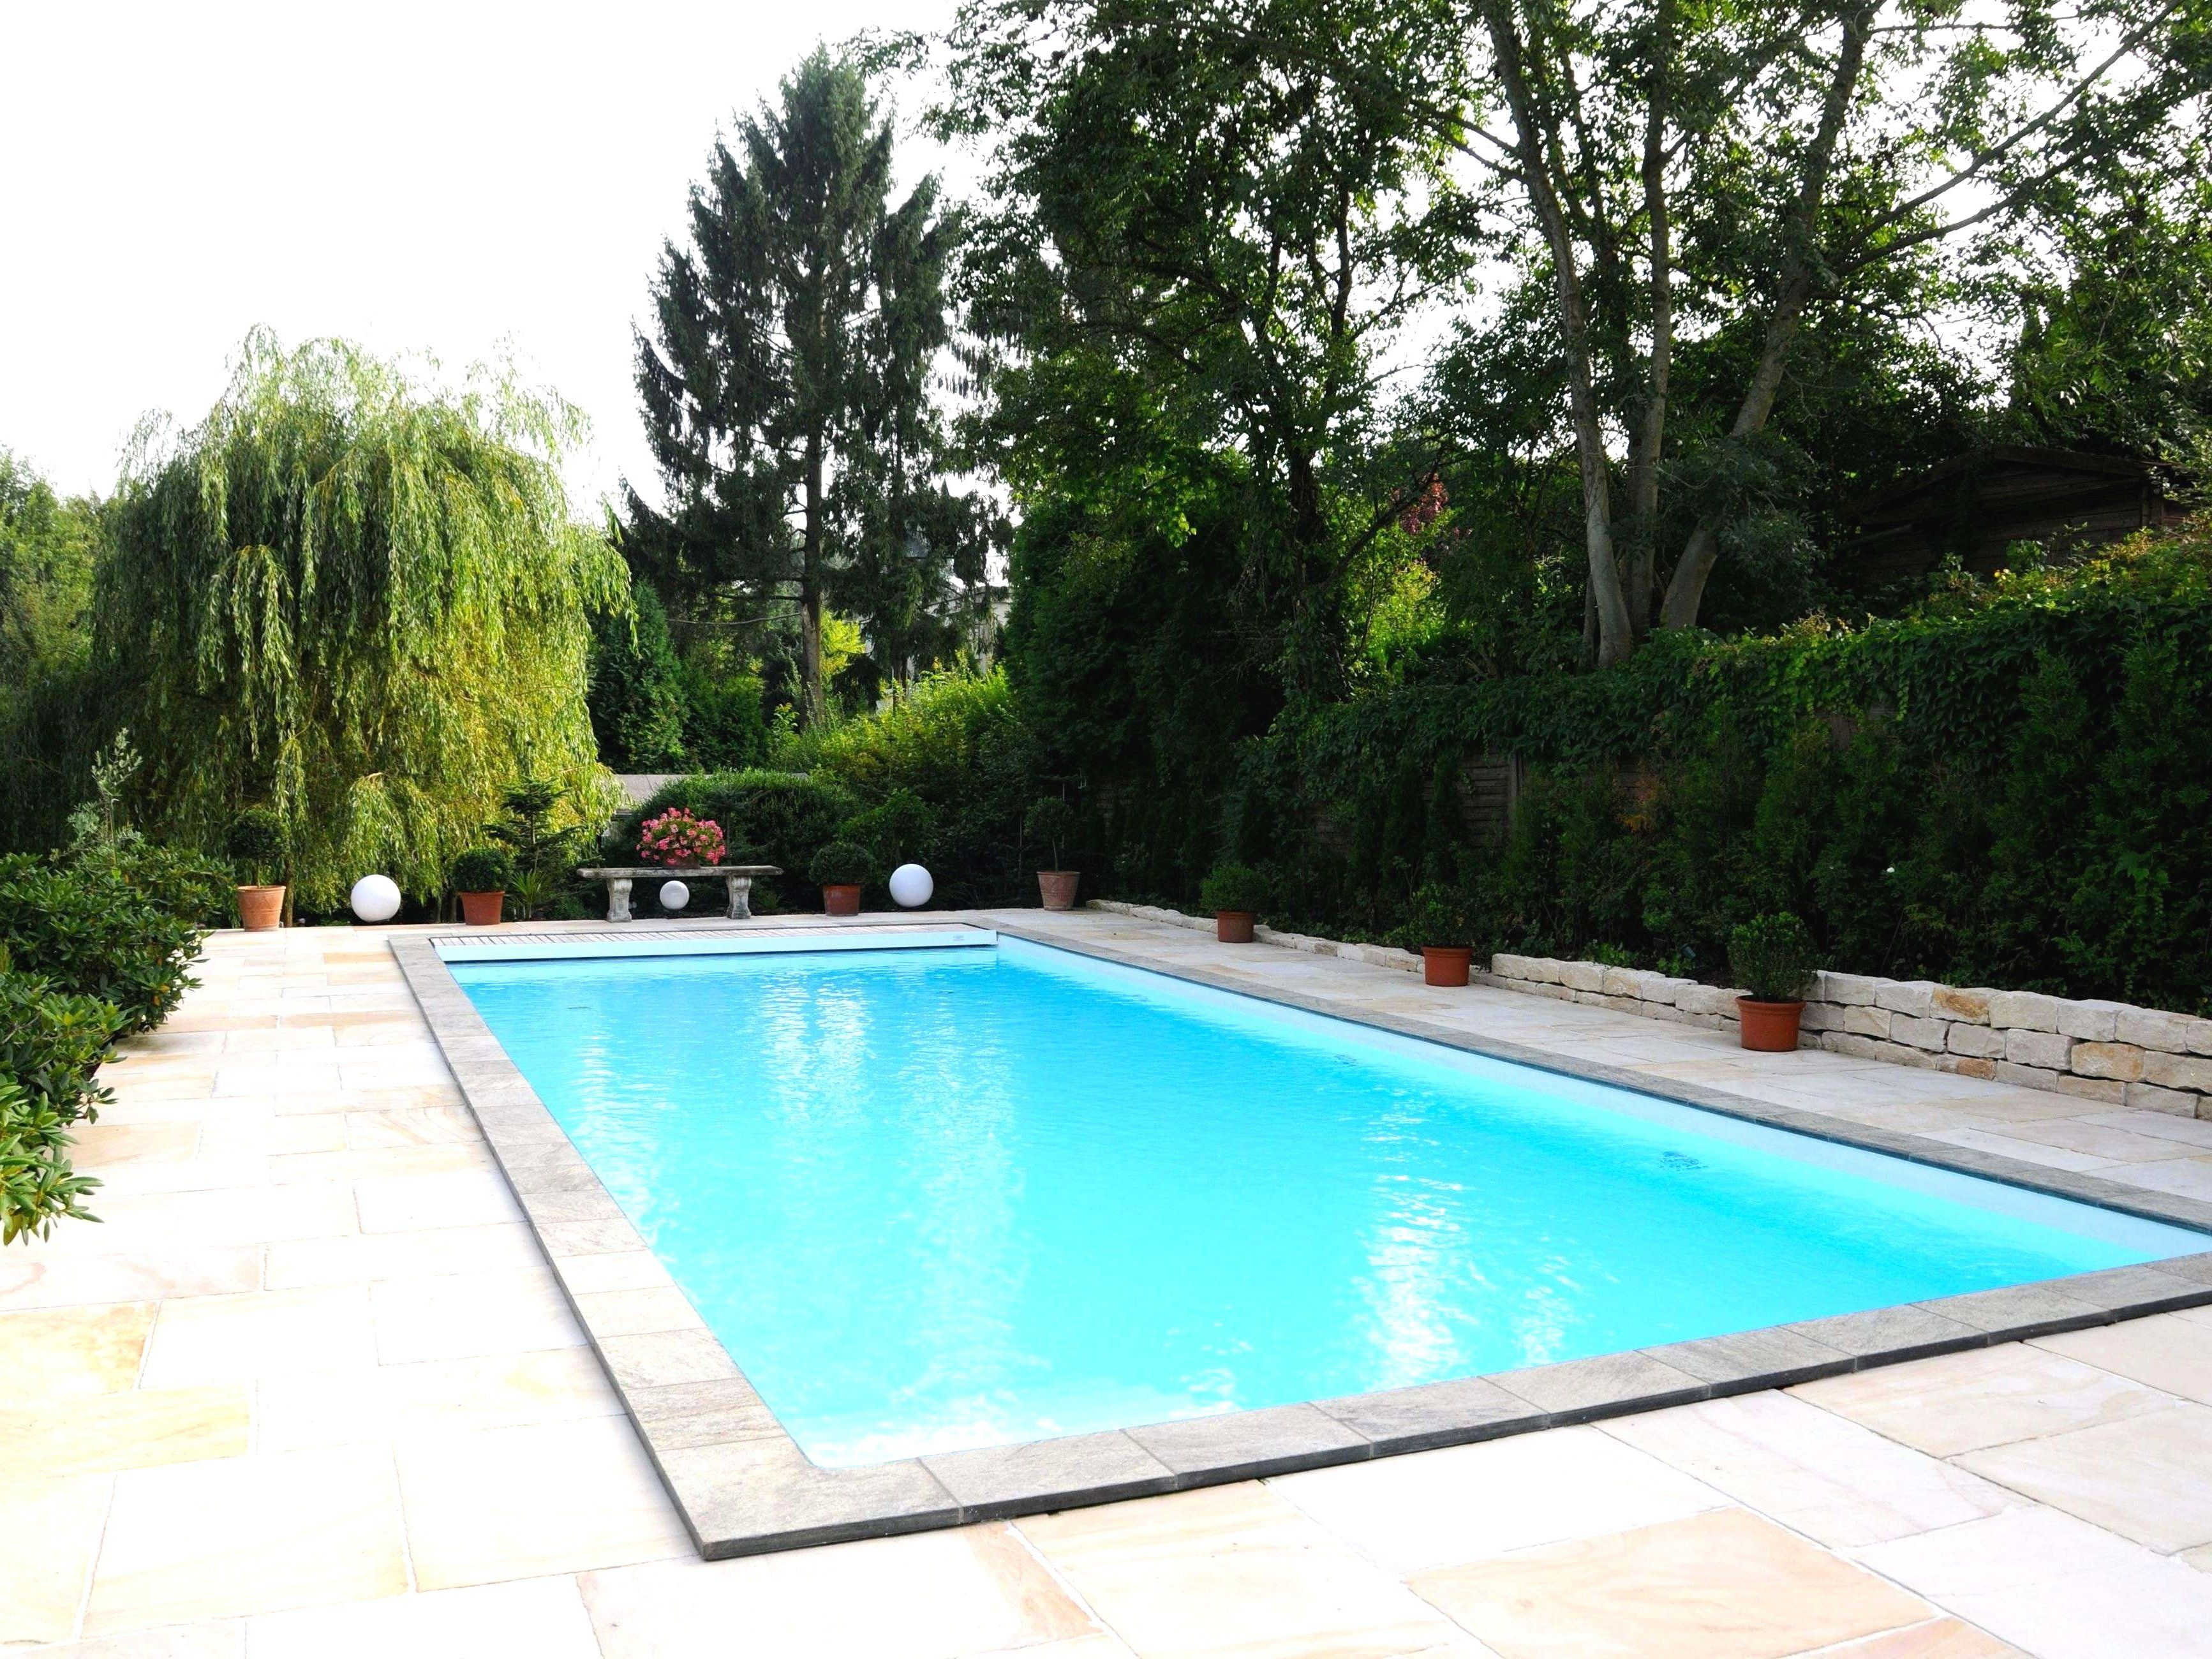 Awesome Pool Garten Kosten Home Ideas In 2019 Home Decor